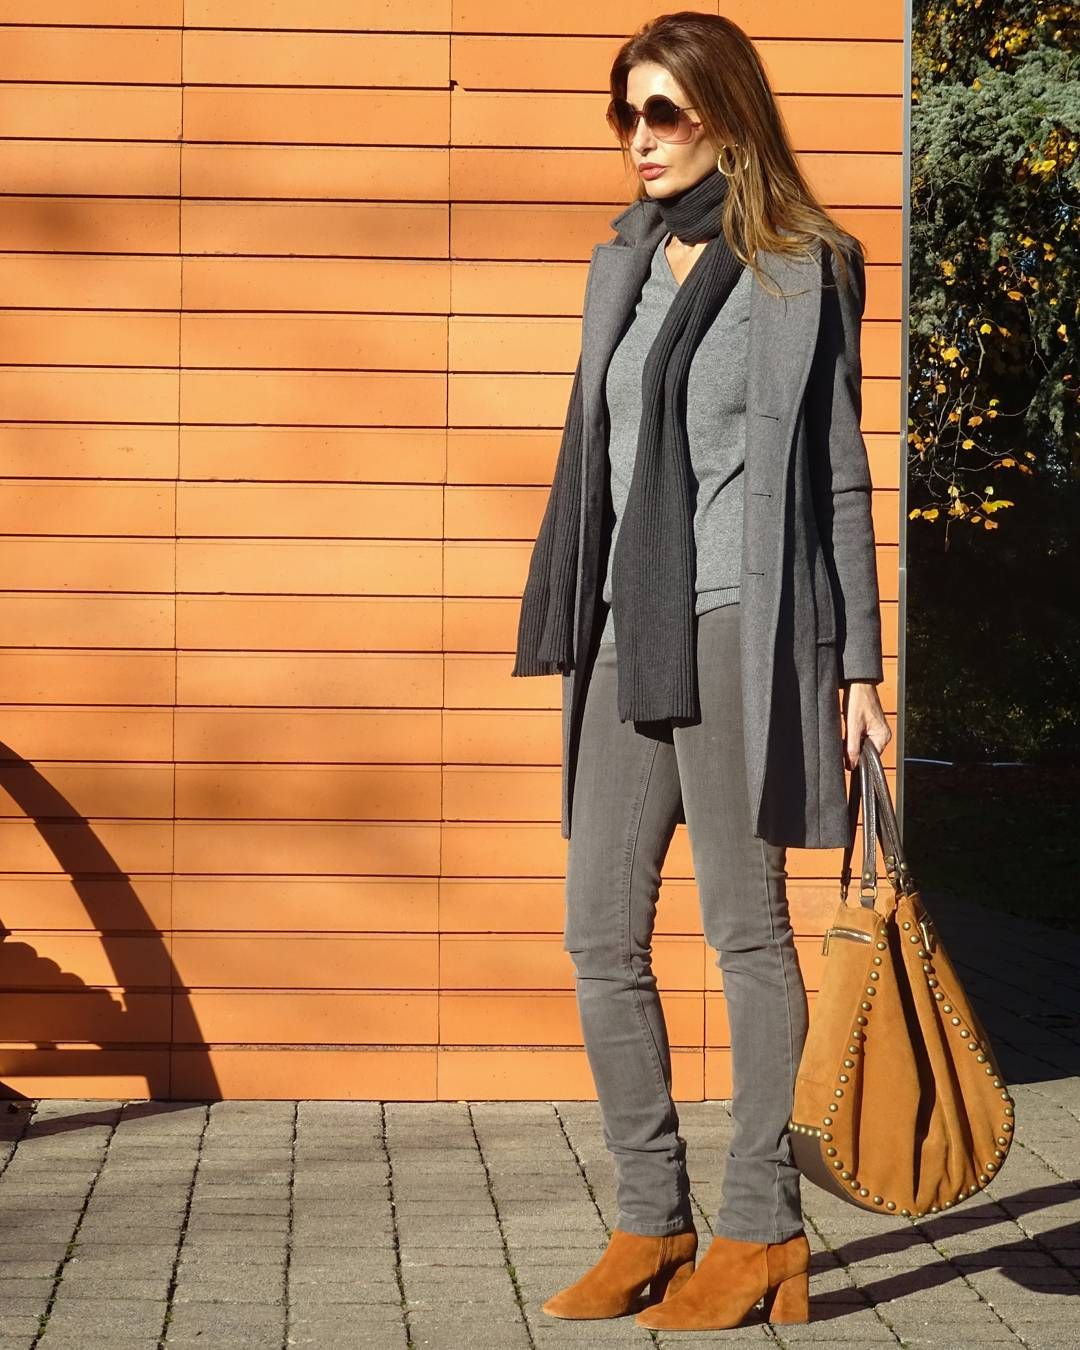 Suéter gris de pico  #by  @cortefiel_official  #escortefiel   #cortefiel_official   #fortyplusstyle    #outfitideas4you    #over40fashion   #over40style   #chicworkchic   #tenuedujour   #lookdujour   #lookdeldia    #outfitdiario   #40plusstyle   #fabulousover40   #fabover40  #lookdelgiorno   #outfitdujour   #gafasdesol   #sunglasses   #me_gusta_tu_look   #buscandoinspiracion   #abito   #abrigo   #coat  #thesartorialist  #cortefiel